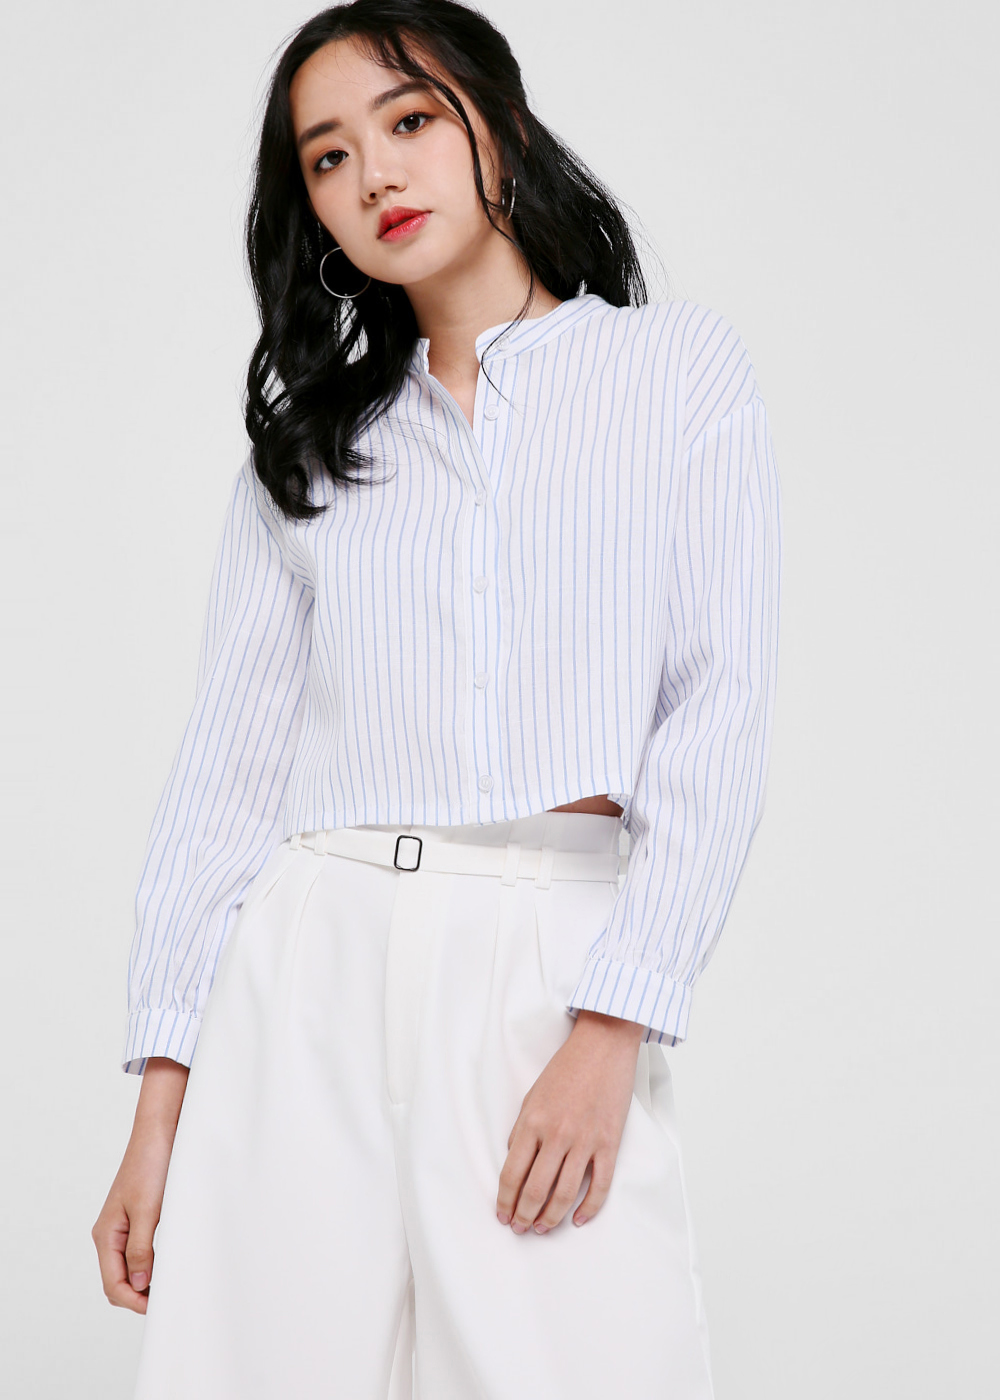 Zephyr Pinstripe Button-Down Shirt